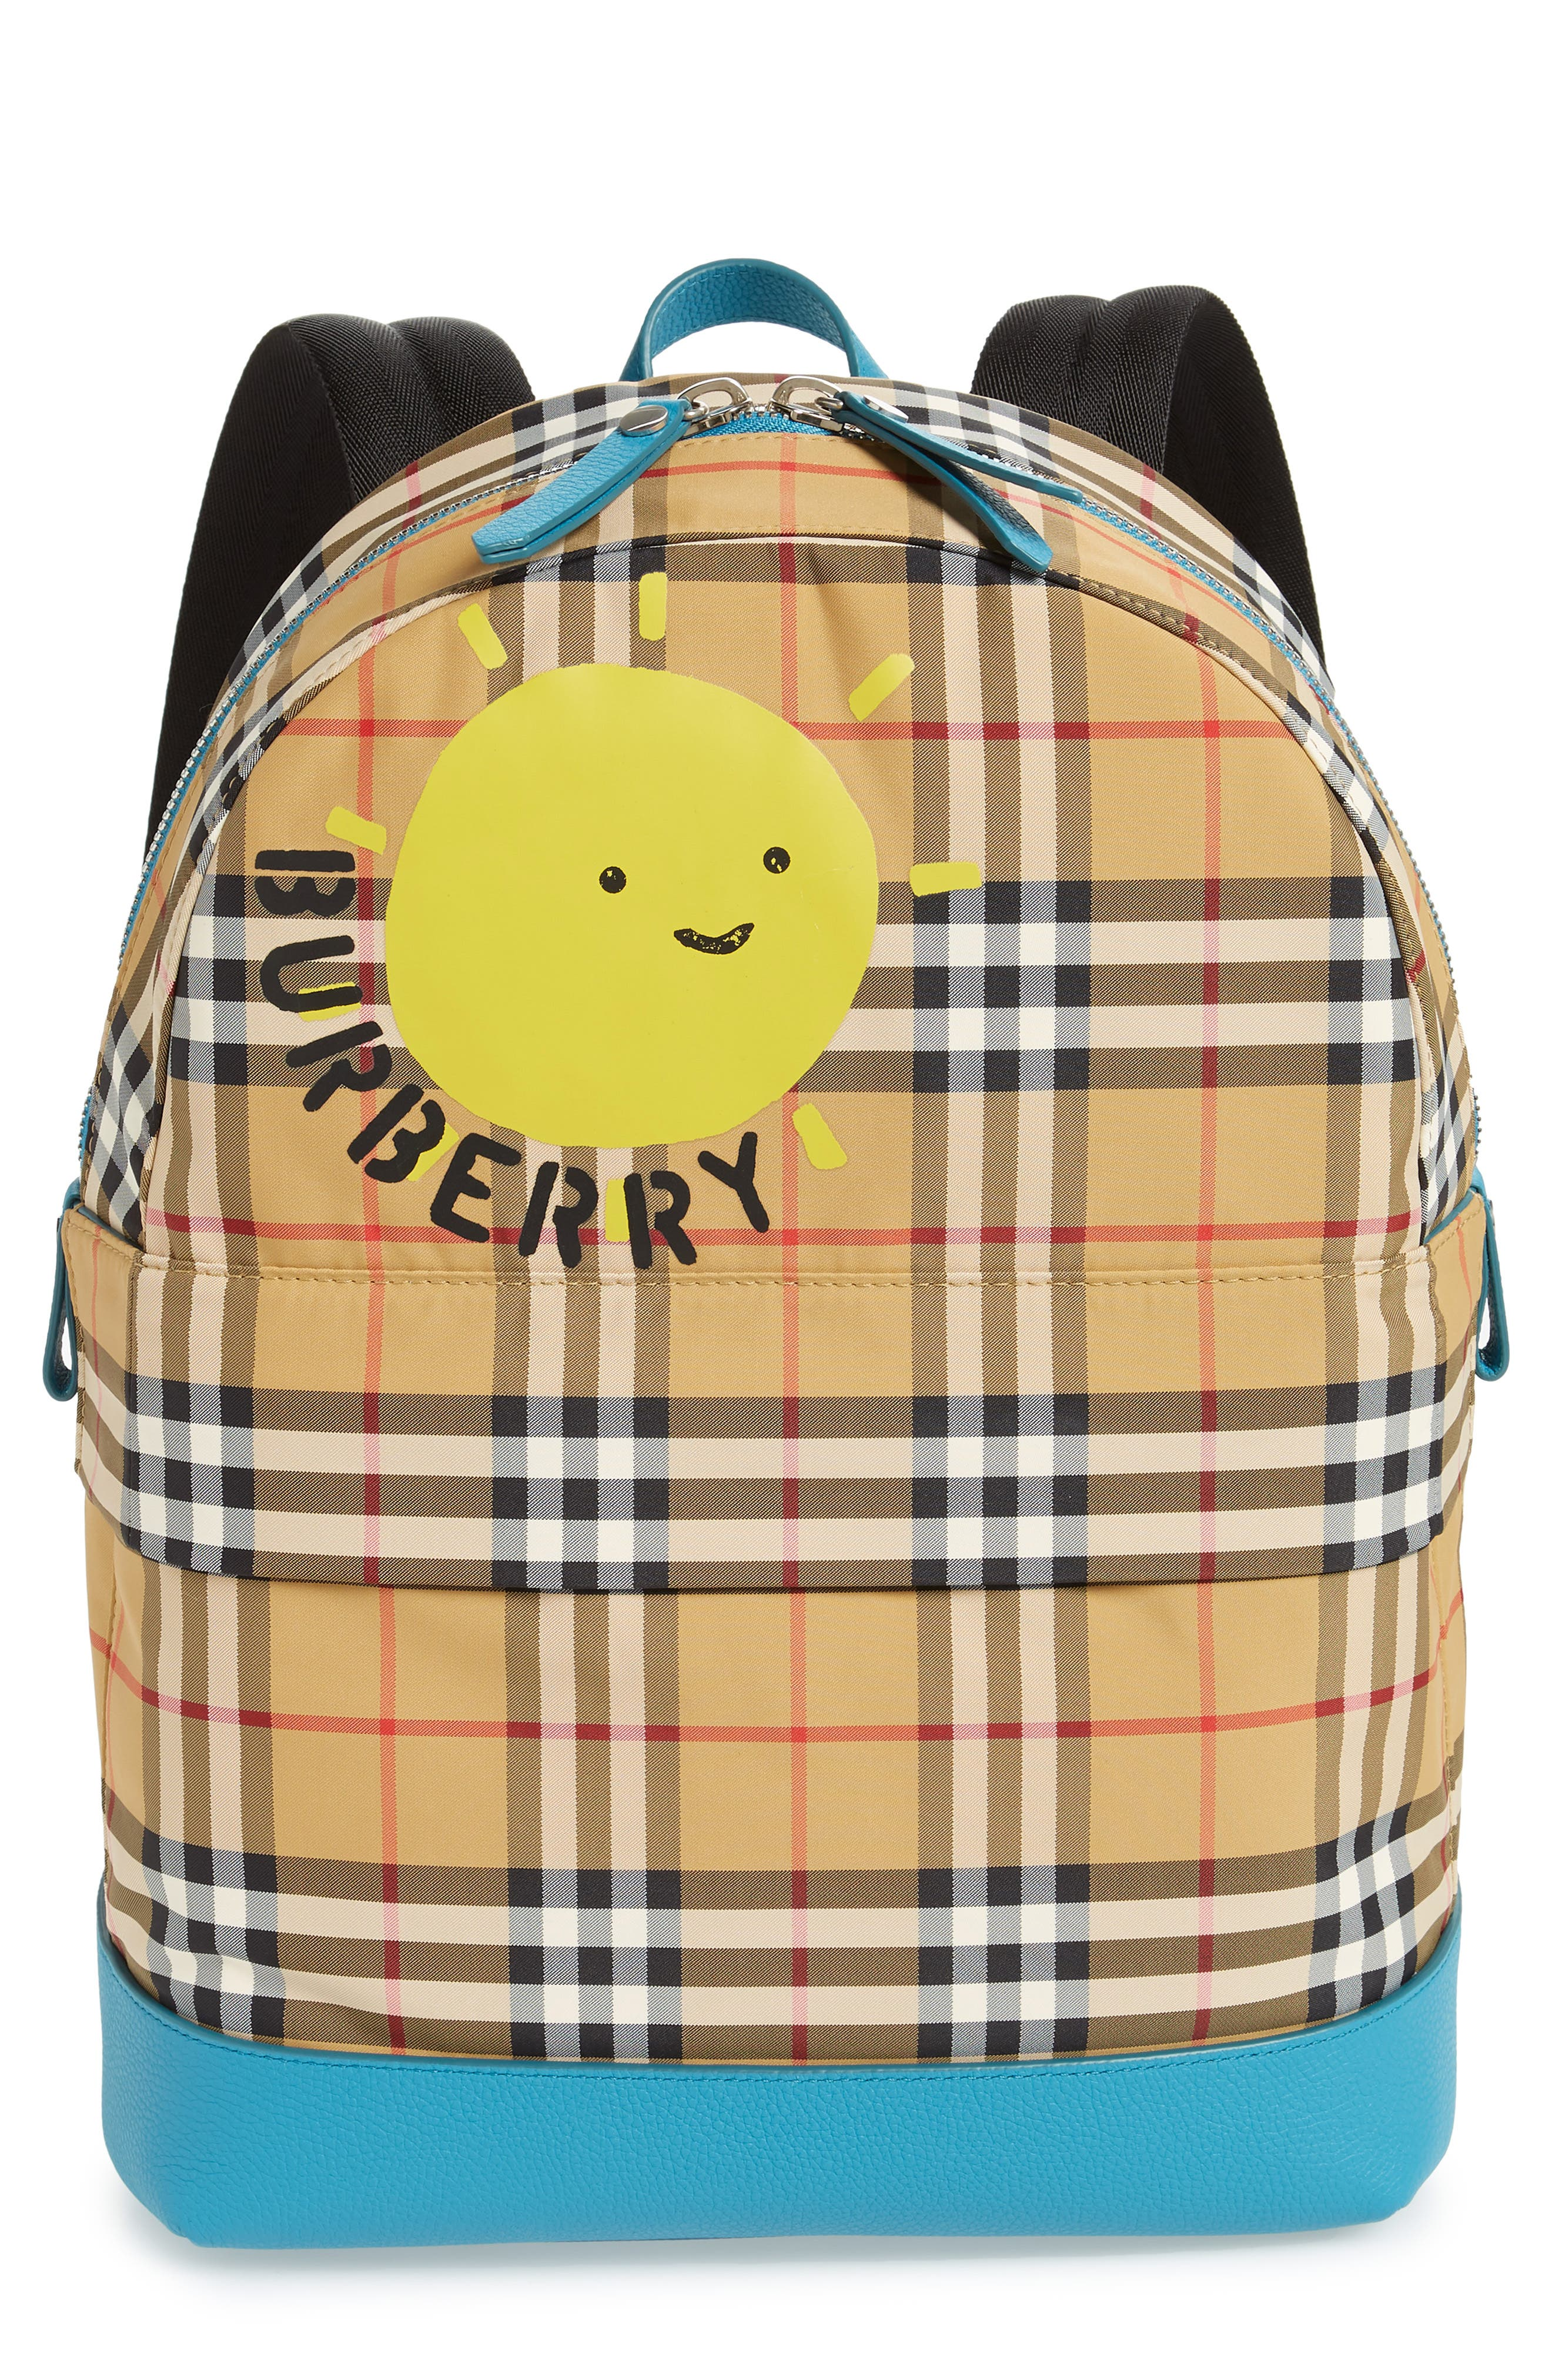 BURBERRY,                             Nico Sun Check Nylon Backpack,                             Main thumbnail 1, color,                             ANTIQUE YELLW IP CHK